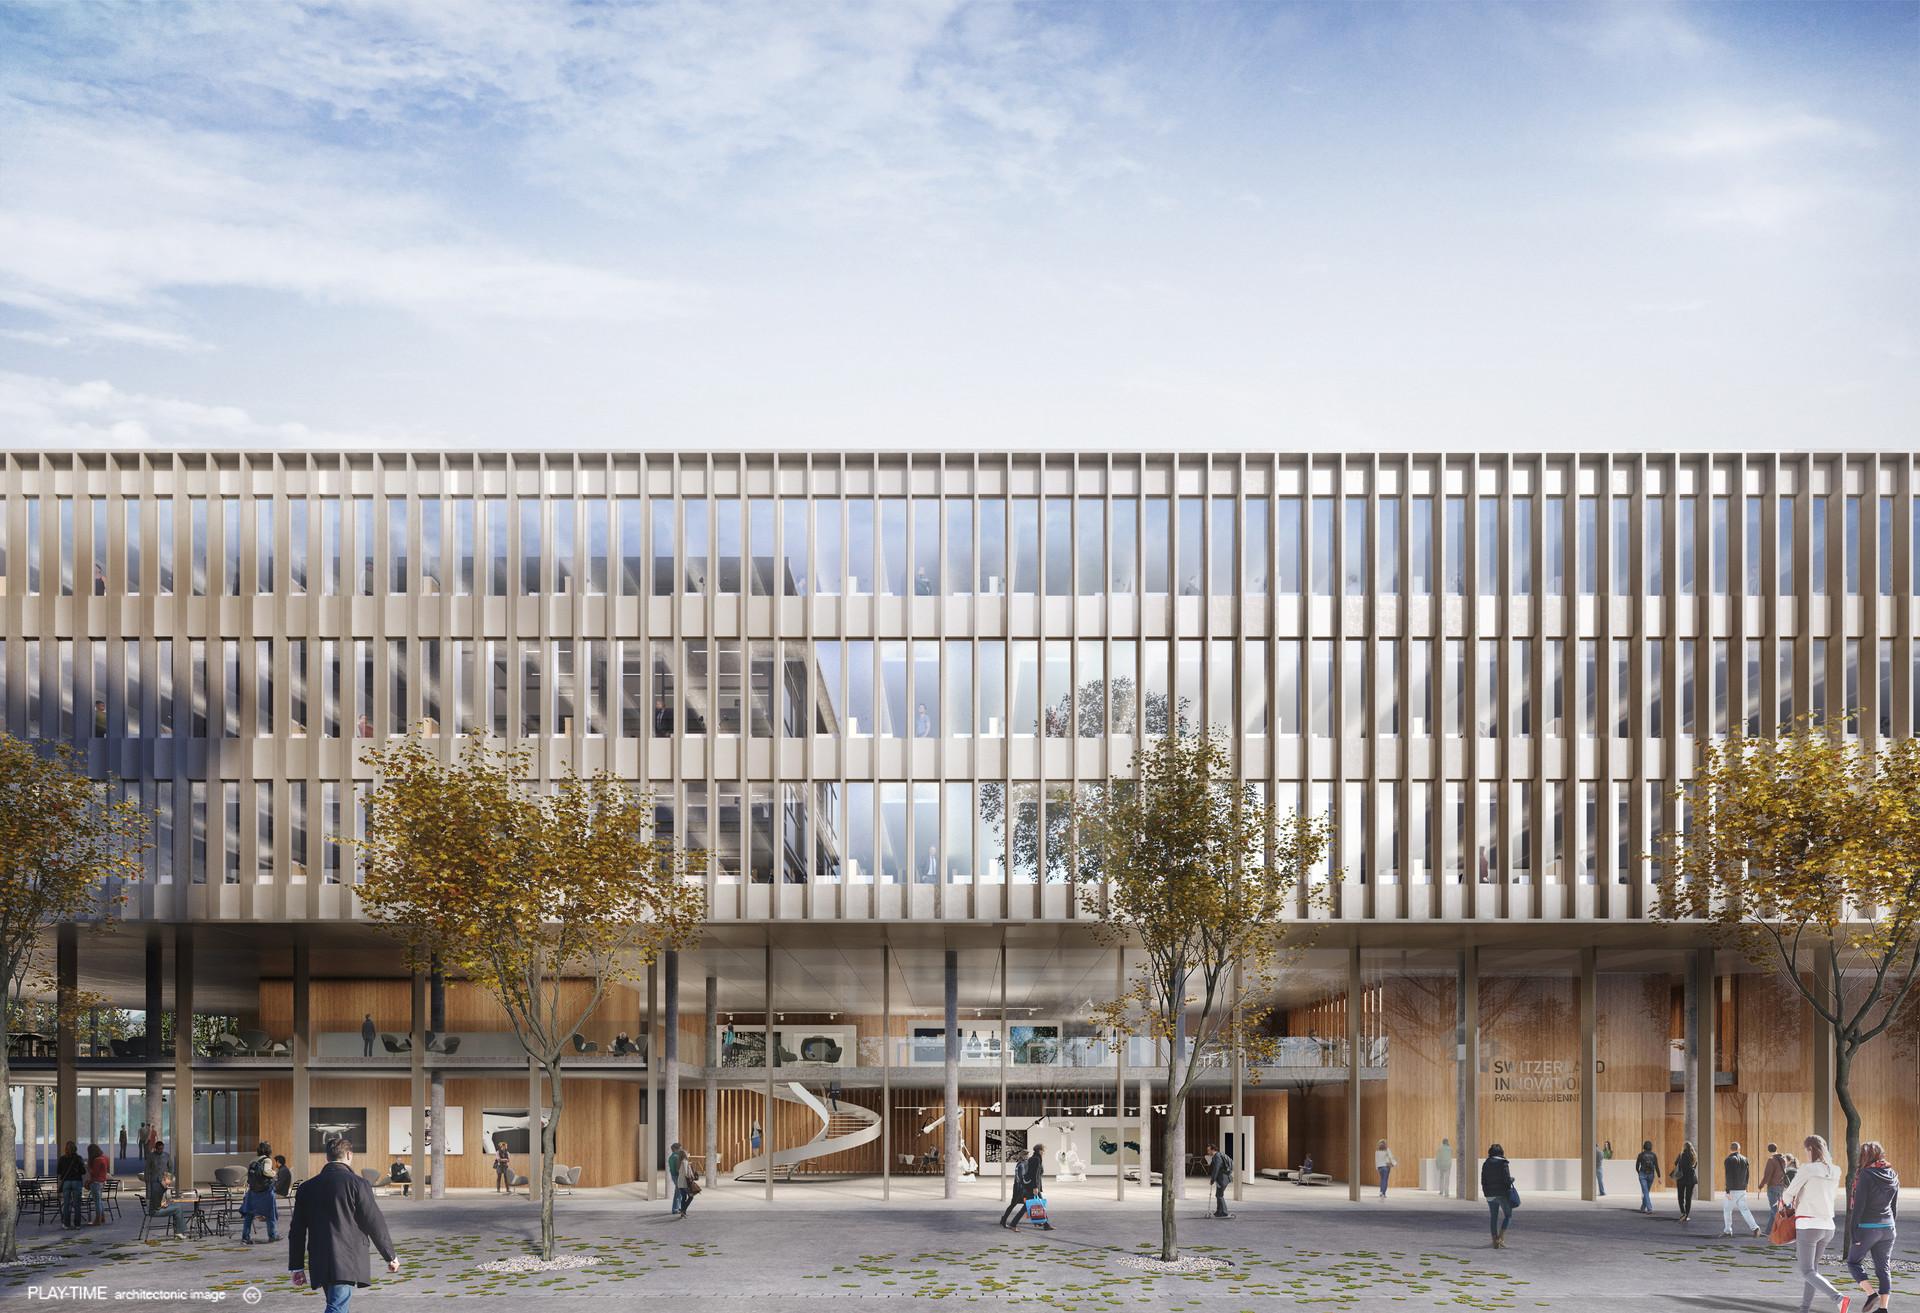 Play time architectonic image gwj architektur innovationspark in biel switzerland